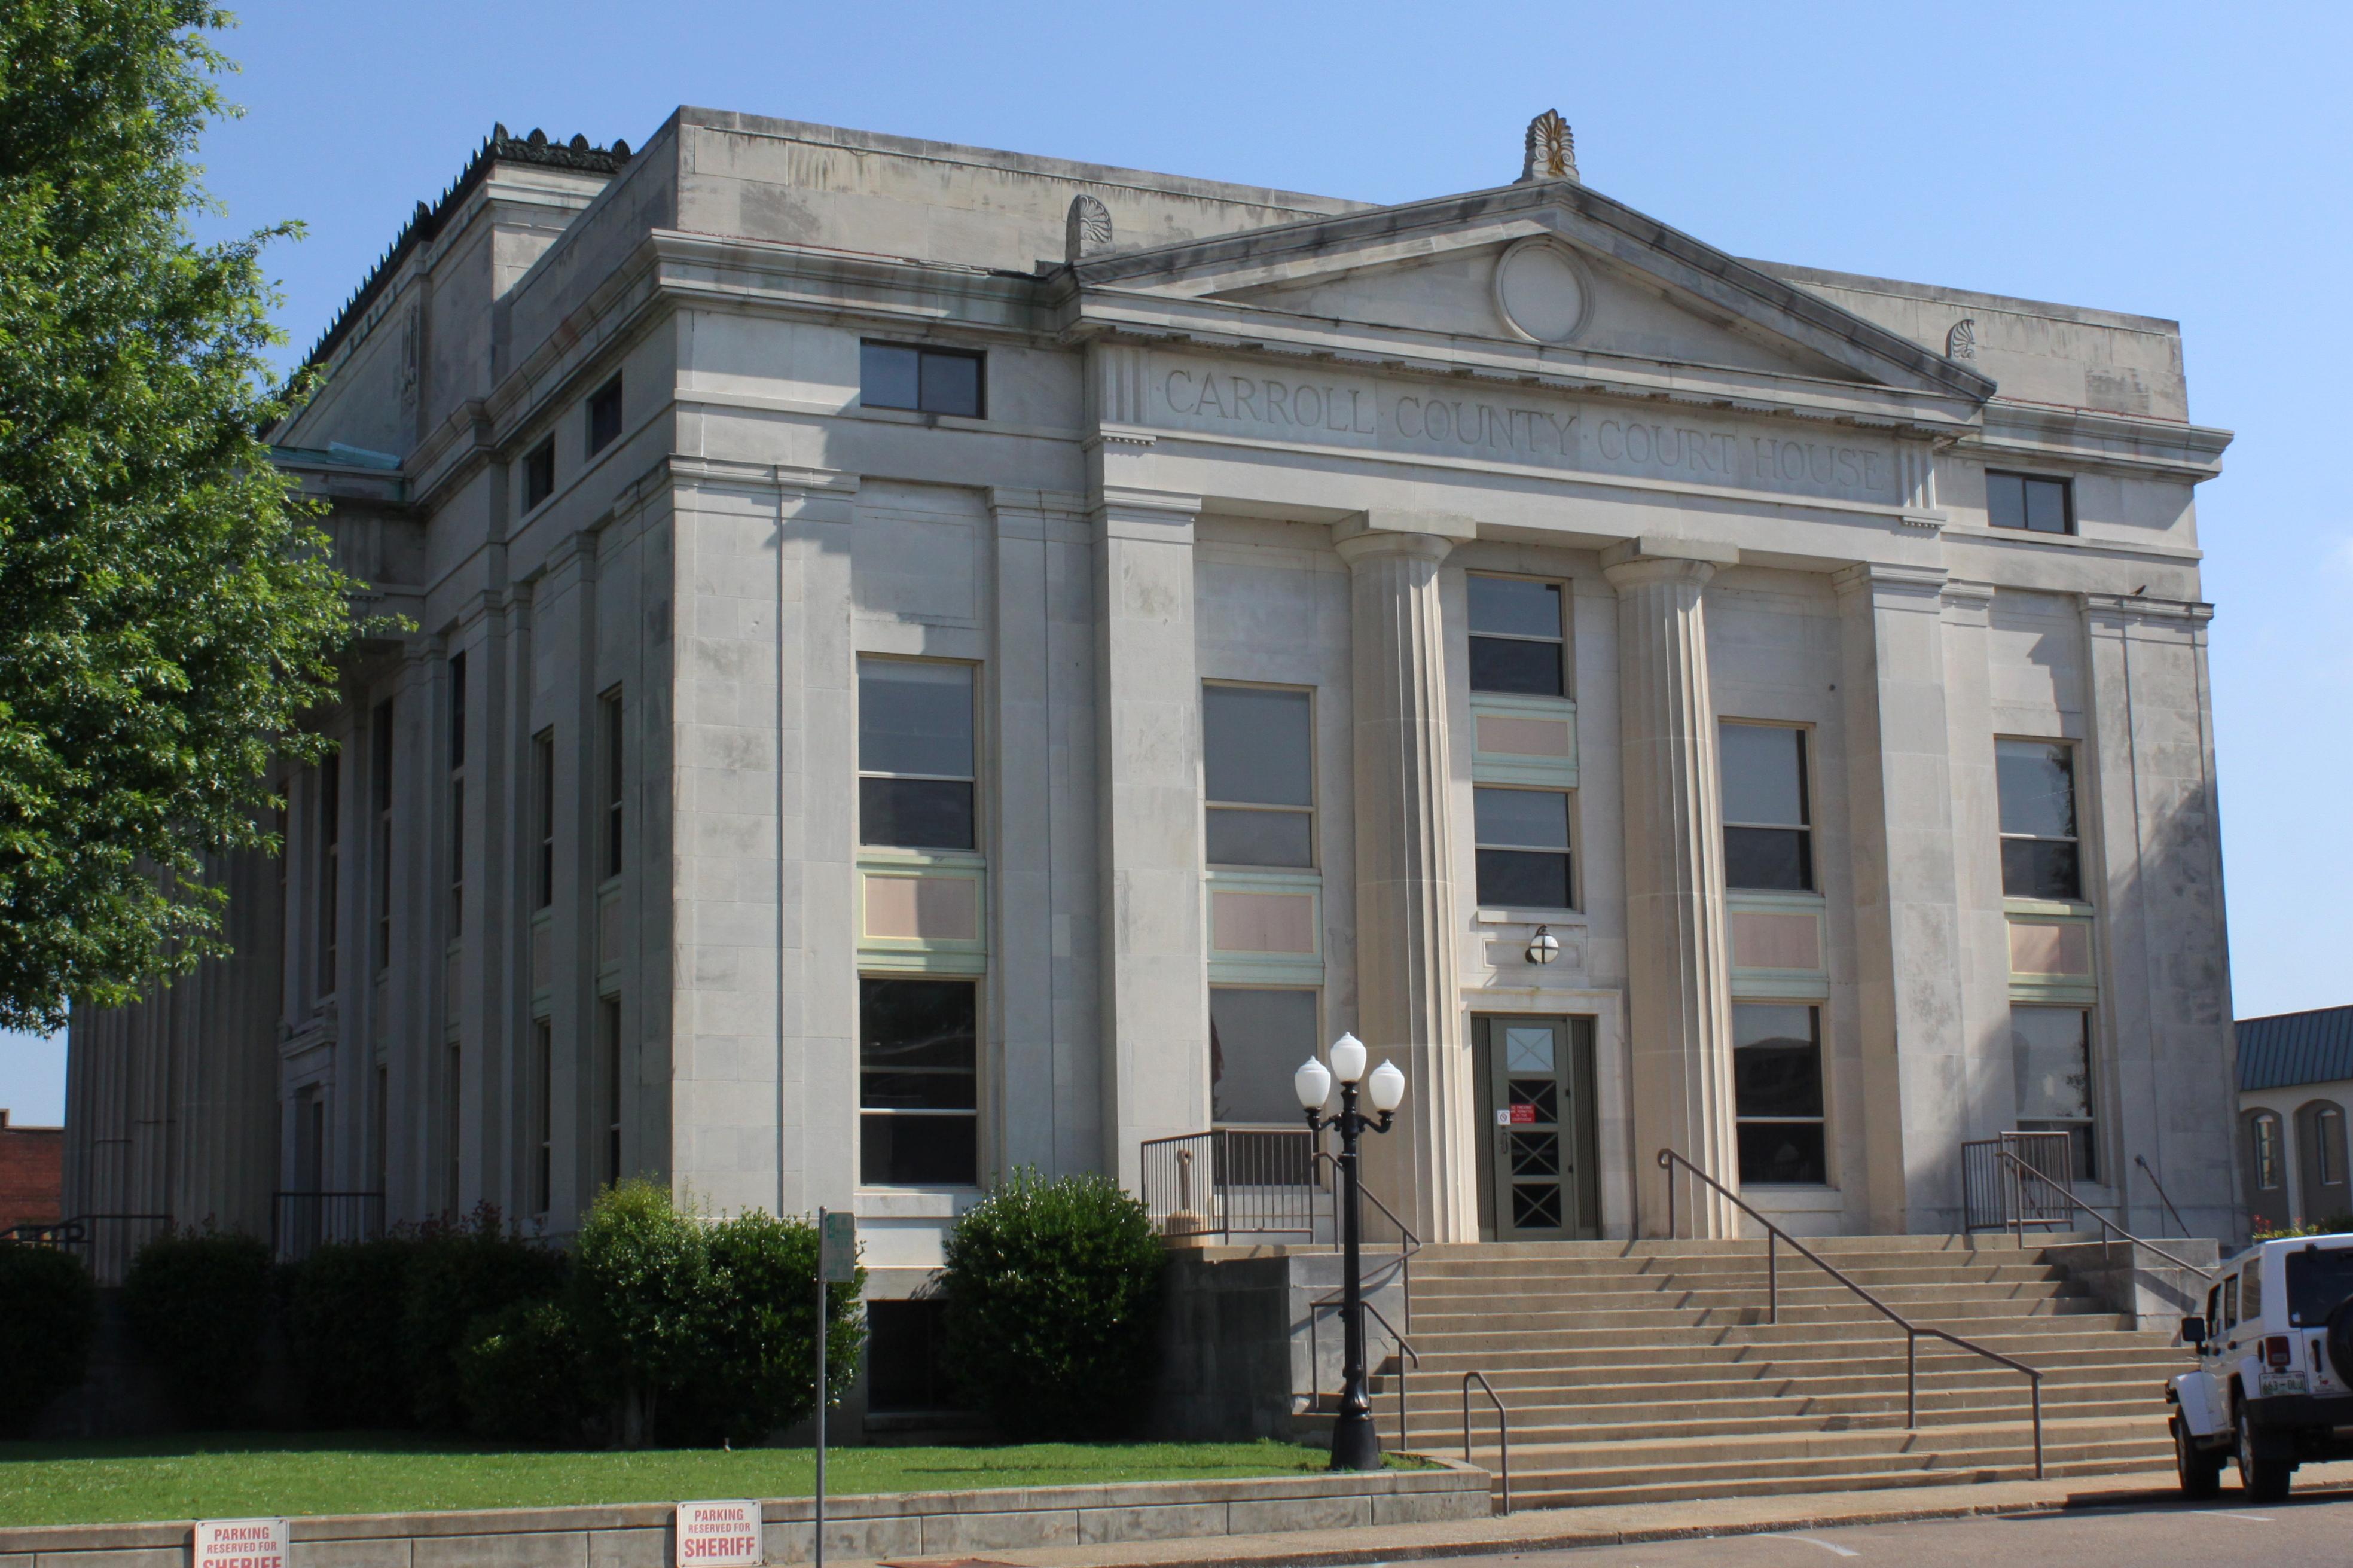 Tennessee carroll county clarksburg - 1931 Tn Tennessee Courthouse Huntingdon Carrollcounty Countycourthouse Bmok Bmok2 Carroll County Courthouse